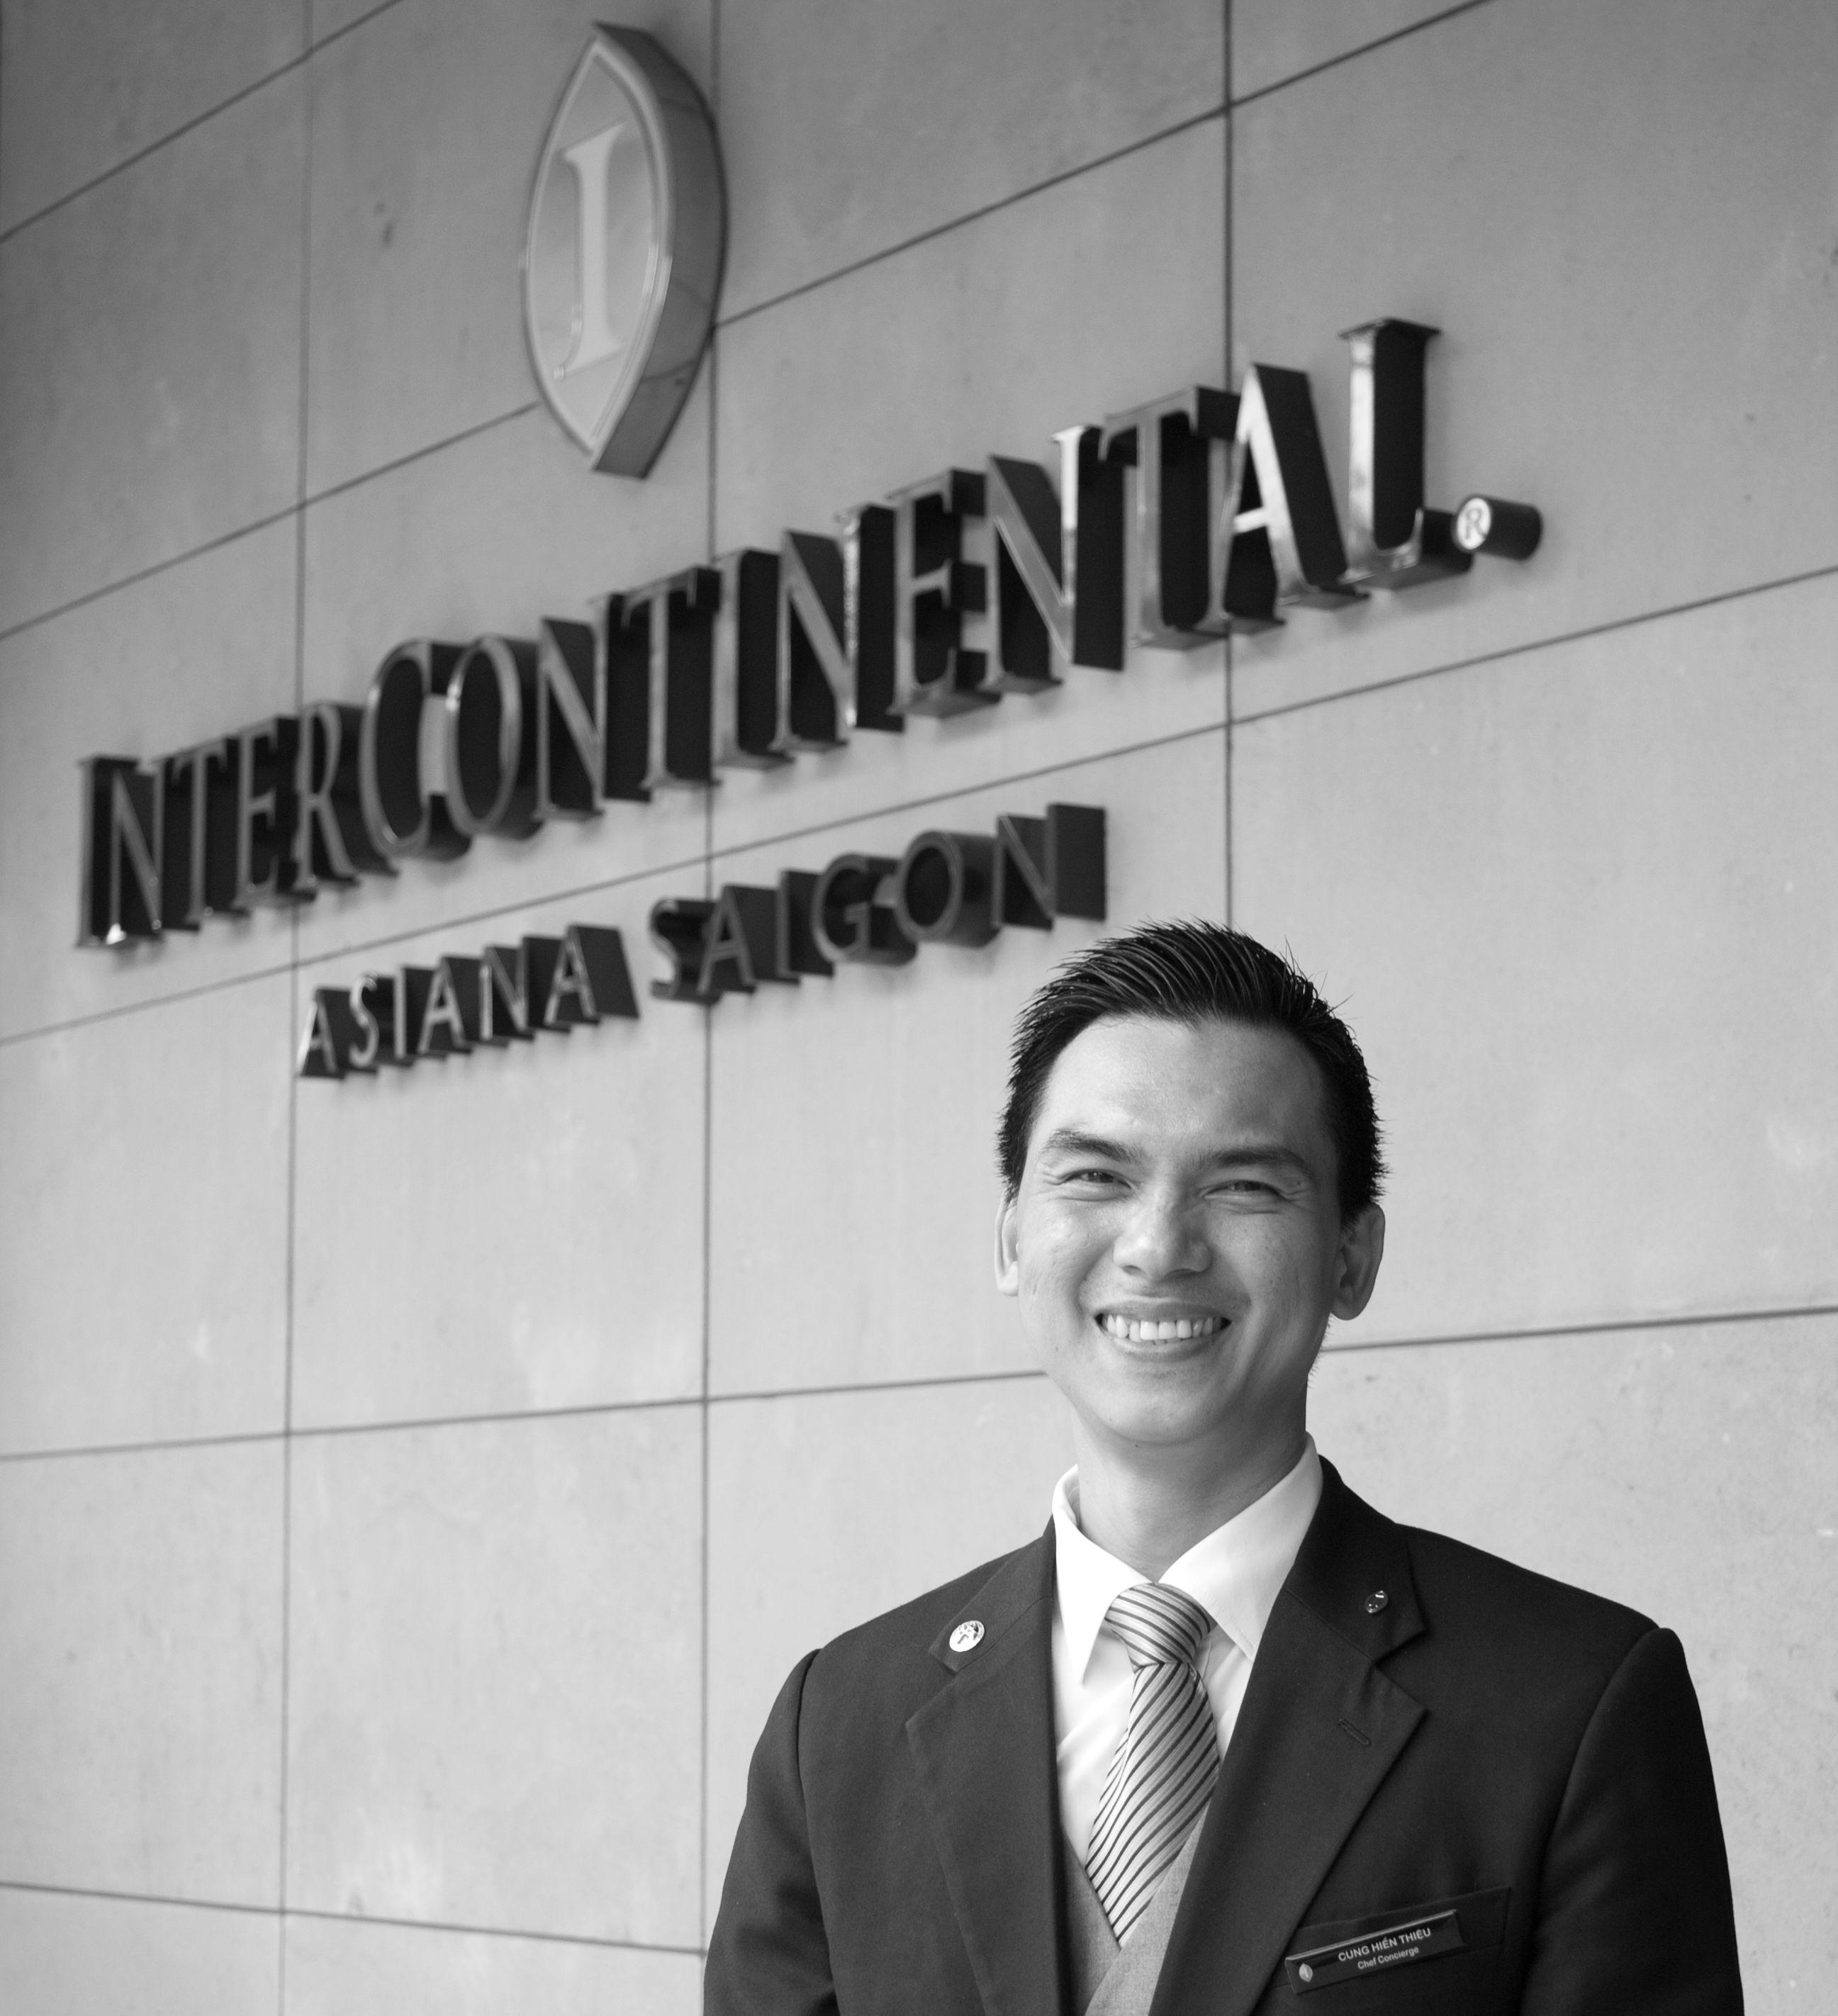 Concierge Photo